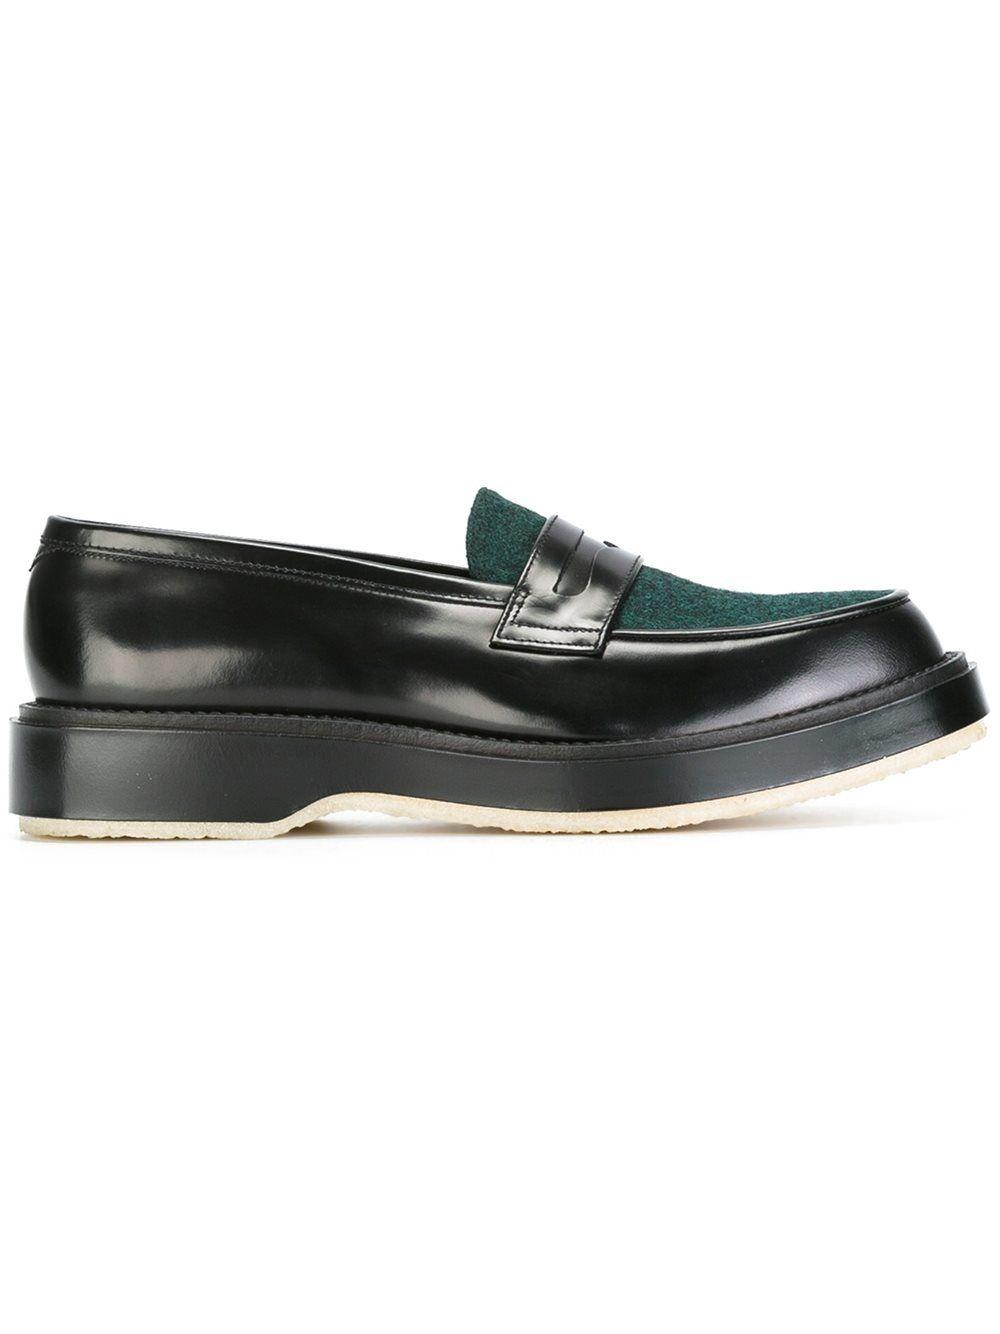 Adieu Paris | Men's Footwear: Loafers | Loafers, Shoe ...